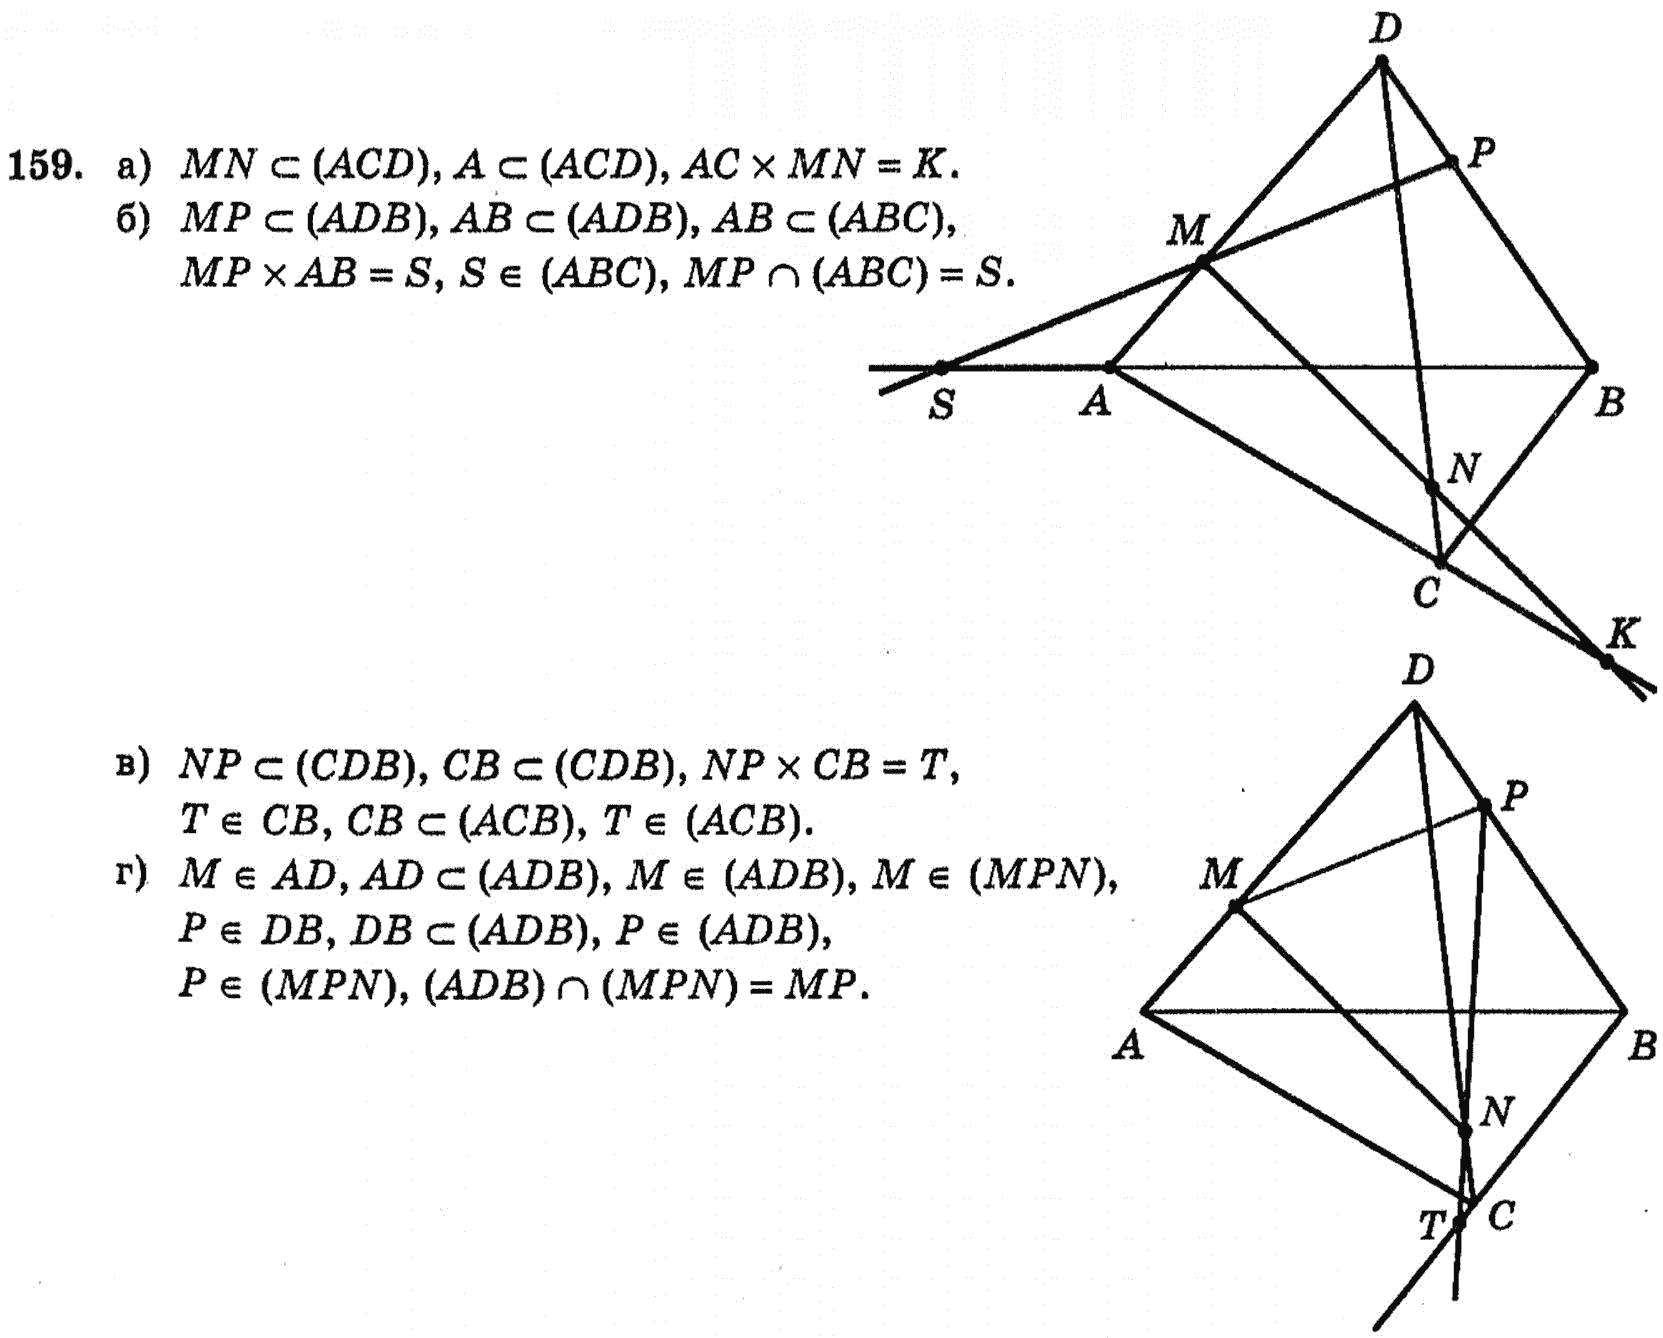 решебник к лесенке по геометрии 10 класс